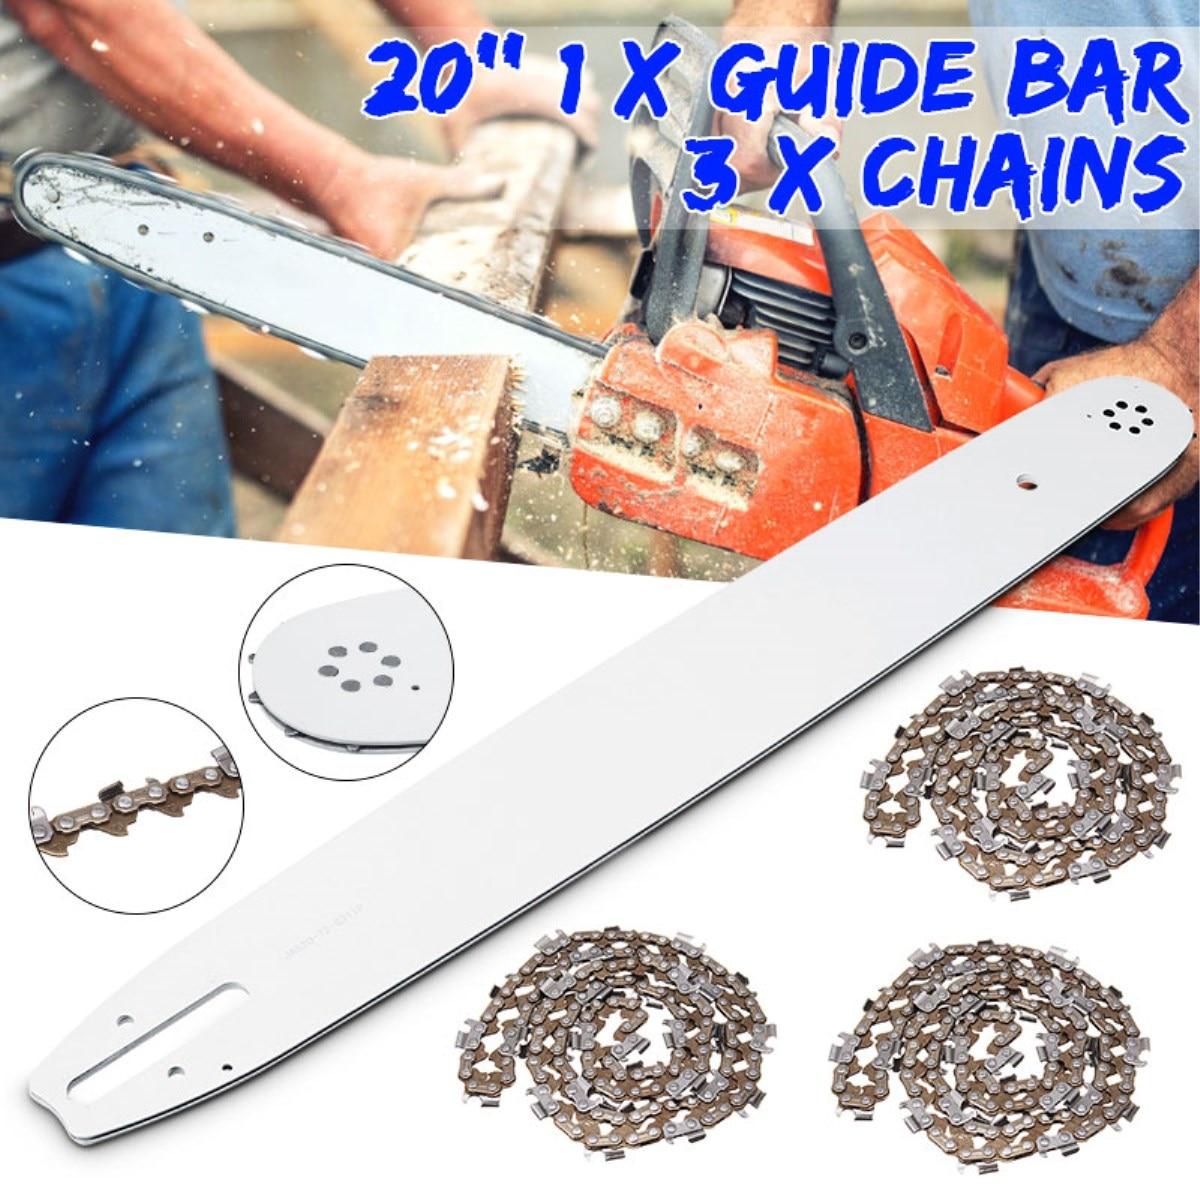 Barra de guía de 20 pulgadas y cadenas de 325 058 76DL para sierra de cadena baumr-ag SX62 SX66 62CC 66CC Accesorios